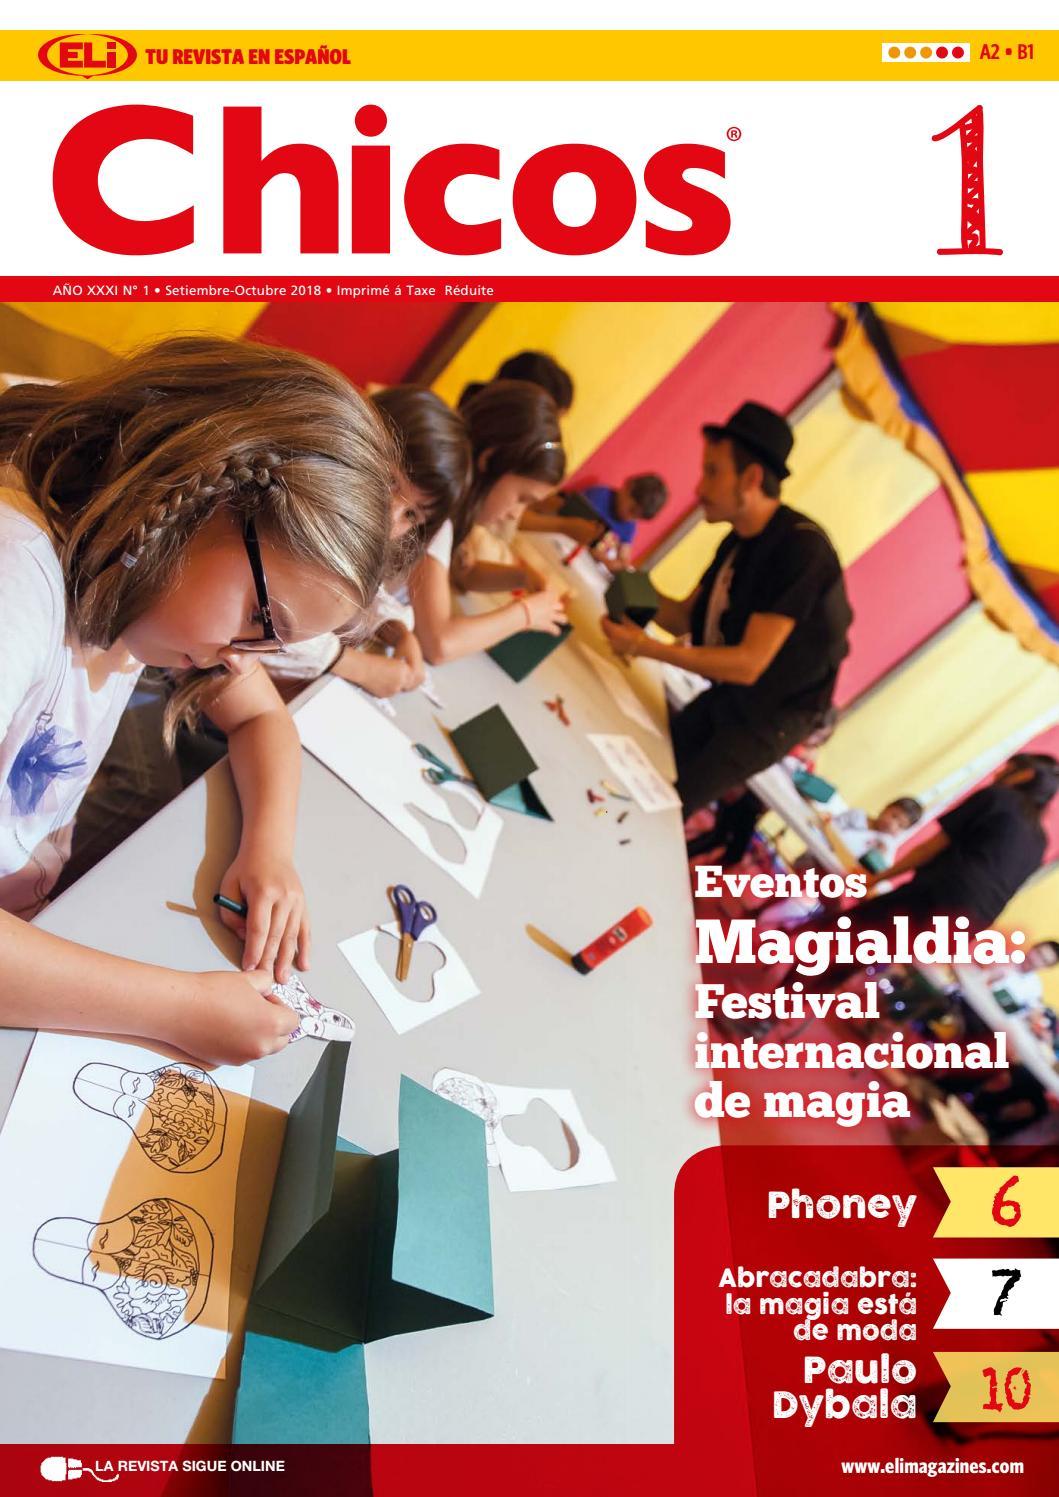 Chicos120182019 By Eli Publishing Issuu